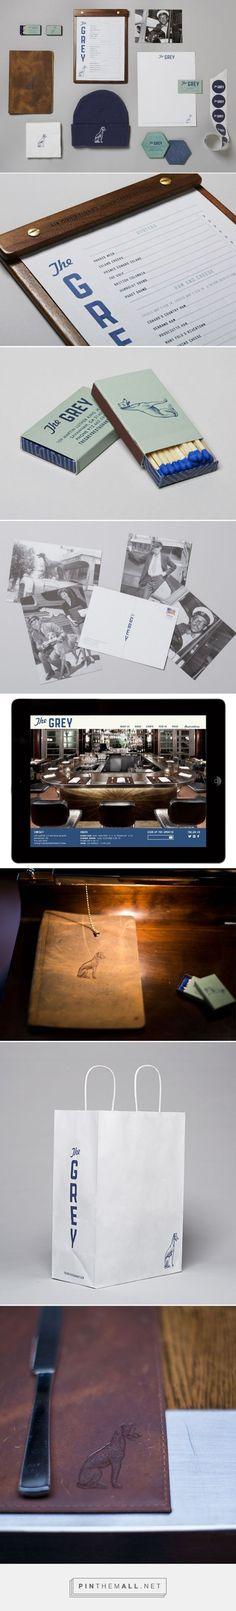 The Grey Restaurant Branding by LMNOP Creative   Fivestar Branding – Design and Branding Agency & Inspiration Gallery   #BrandingInspiration